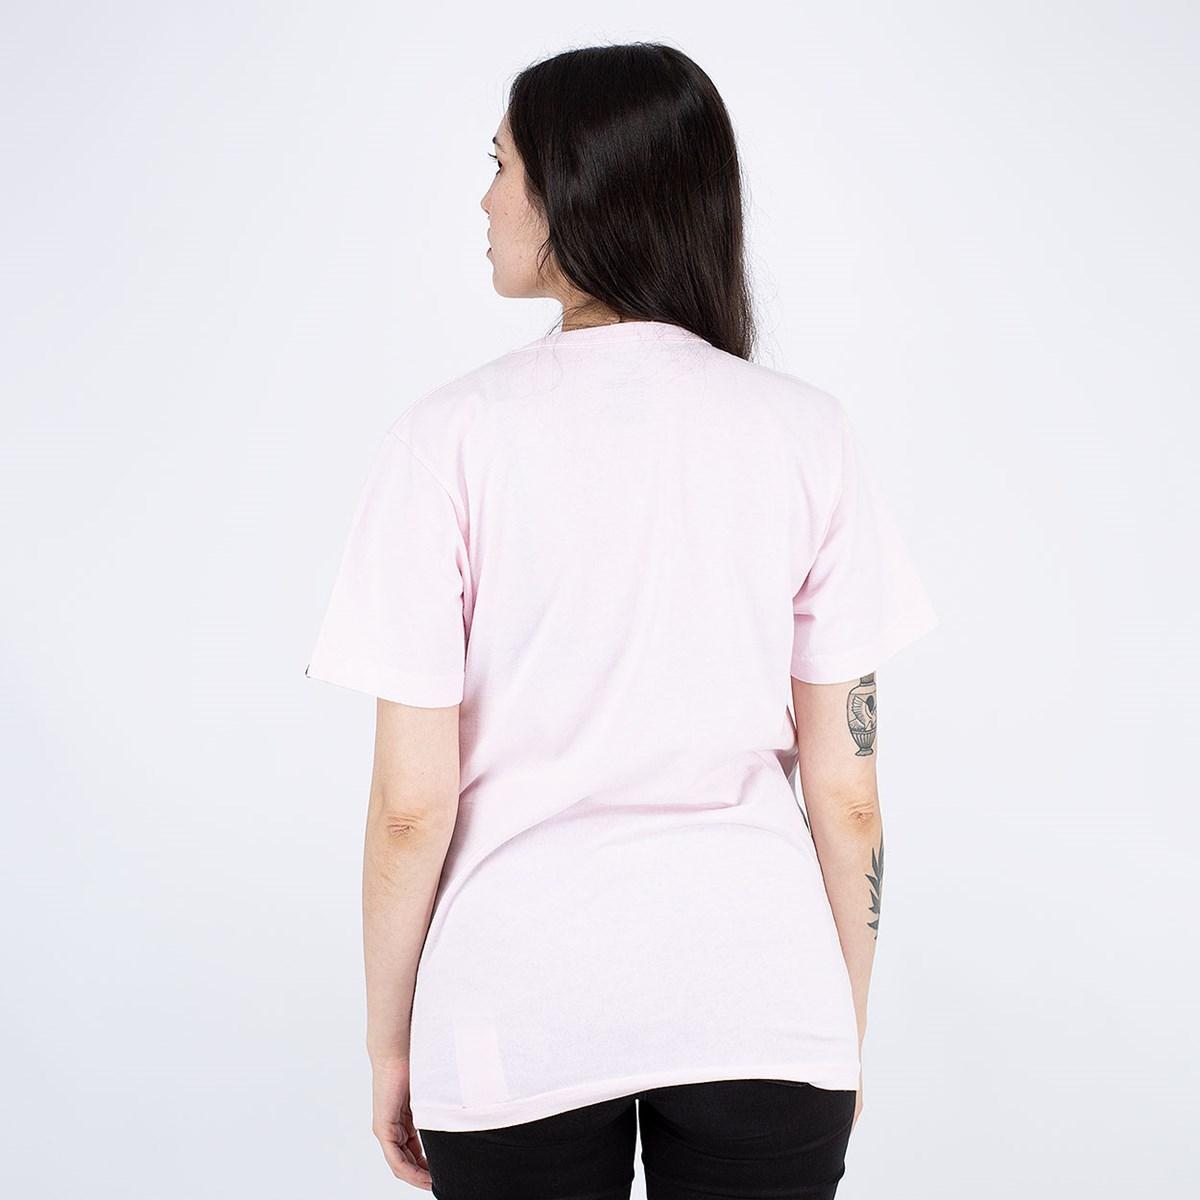 Camiseta Vans X Chris Johanson Powder Pink VN0A5EB5ZJY